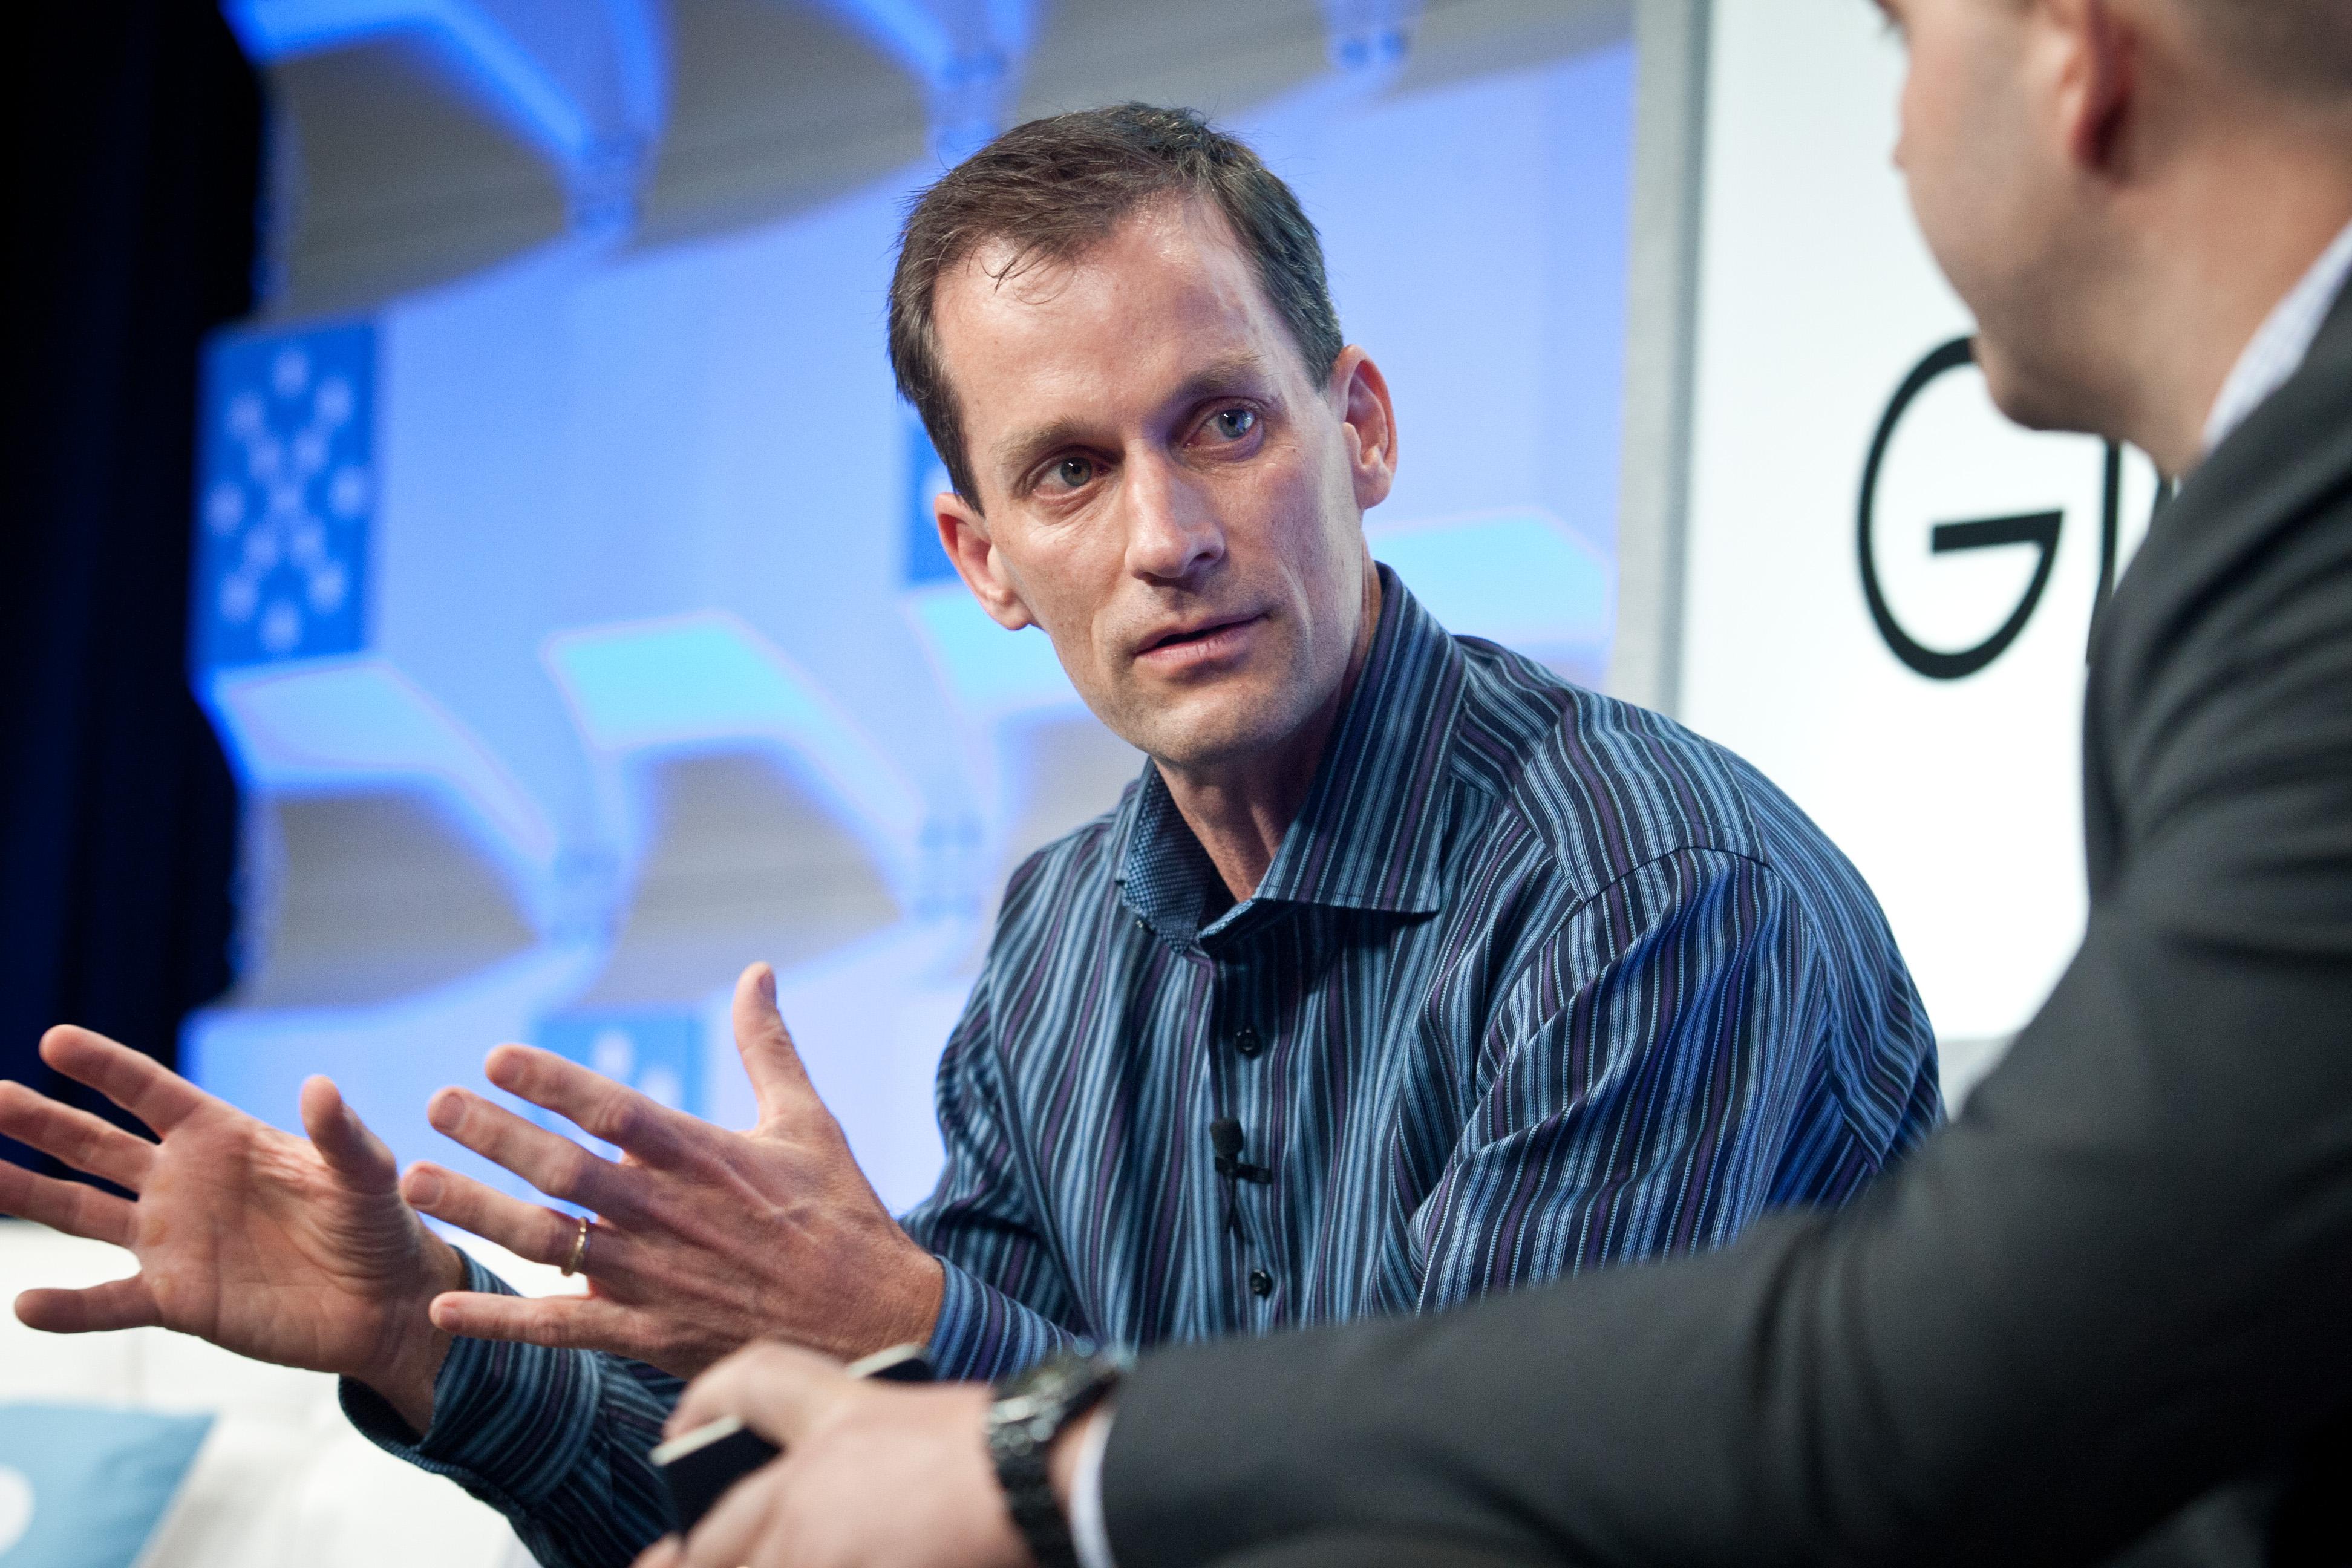 Jeffrey Dean - Google Fellow, Google